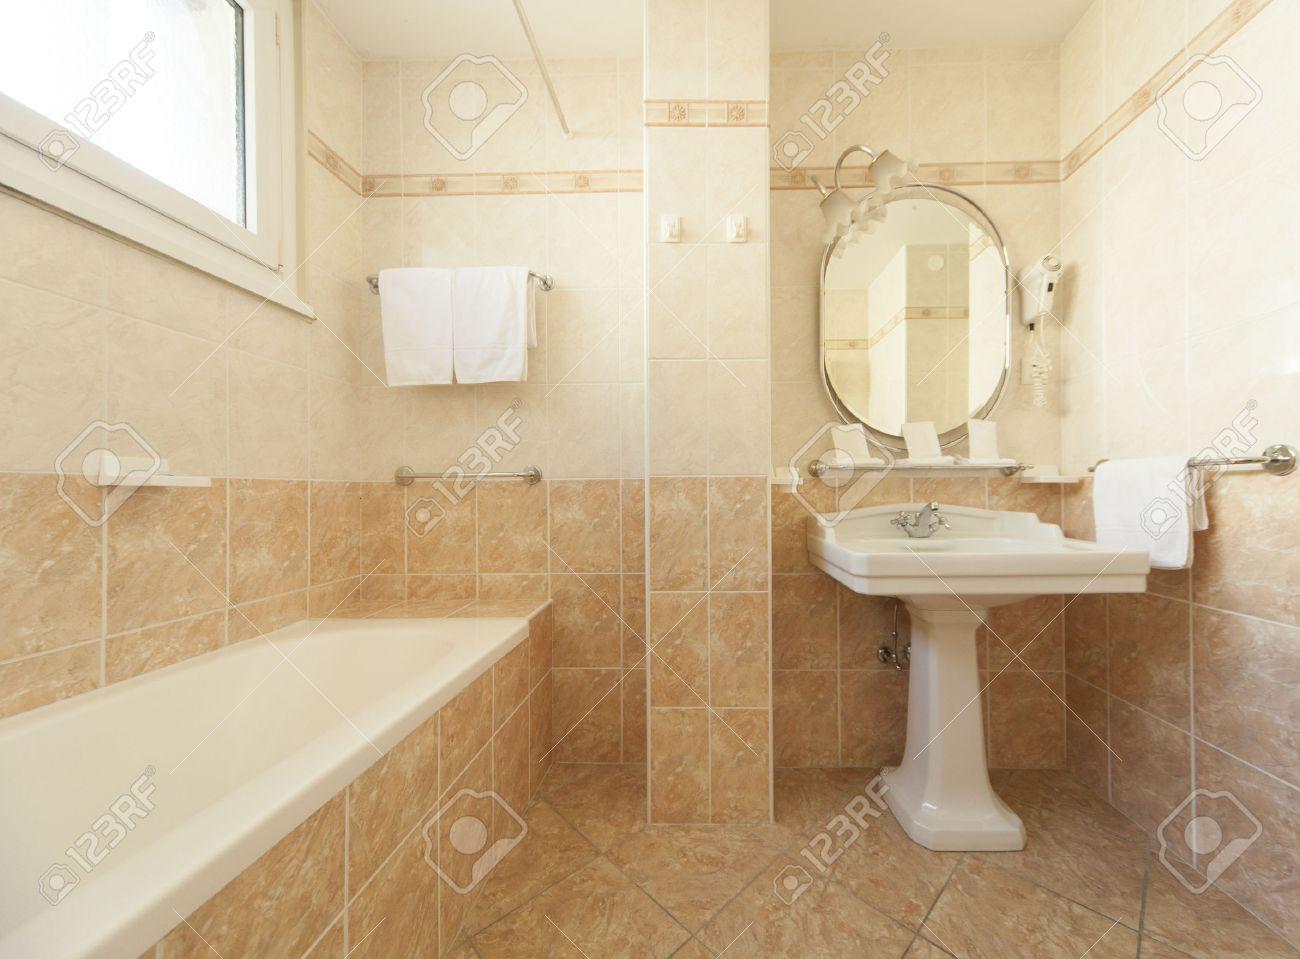 carrelage beige salle de bain - fashion designs - Carrelage Beige Salle De Bain